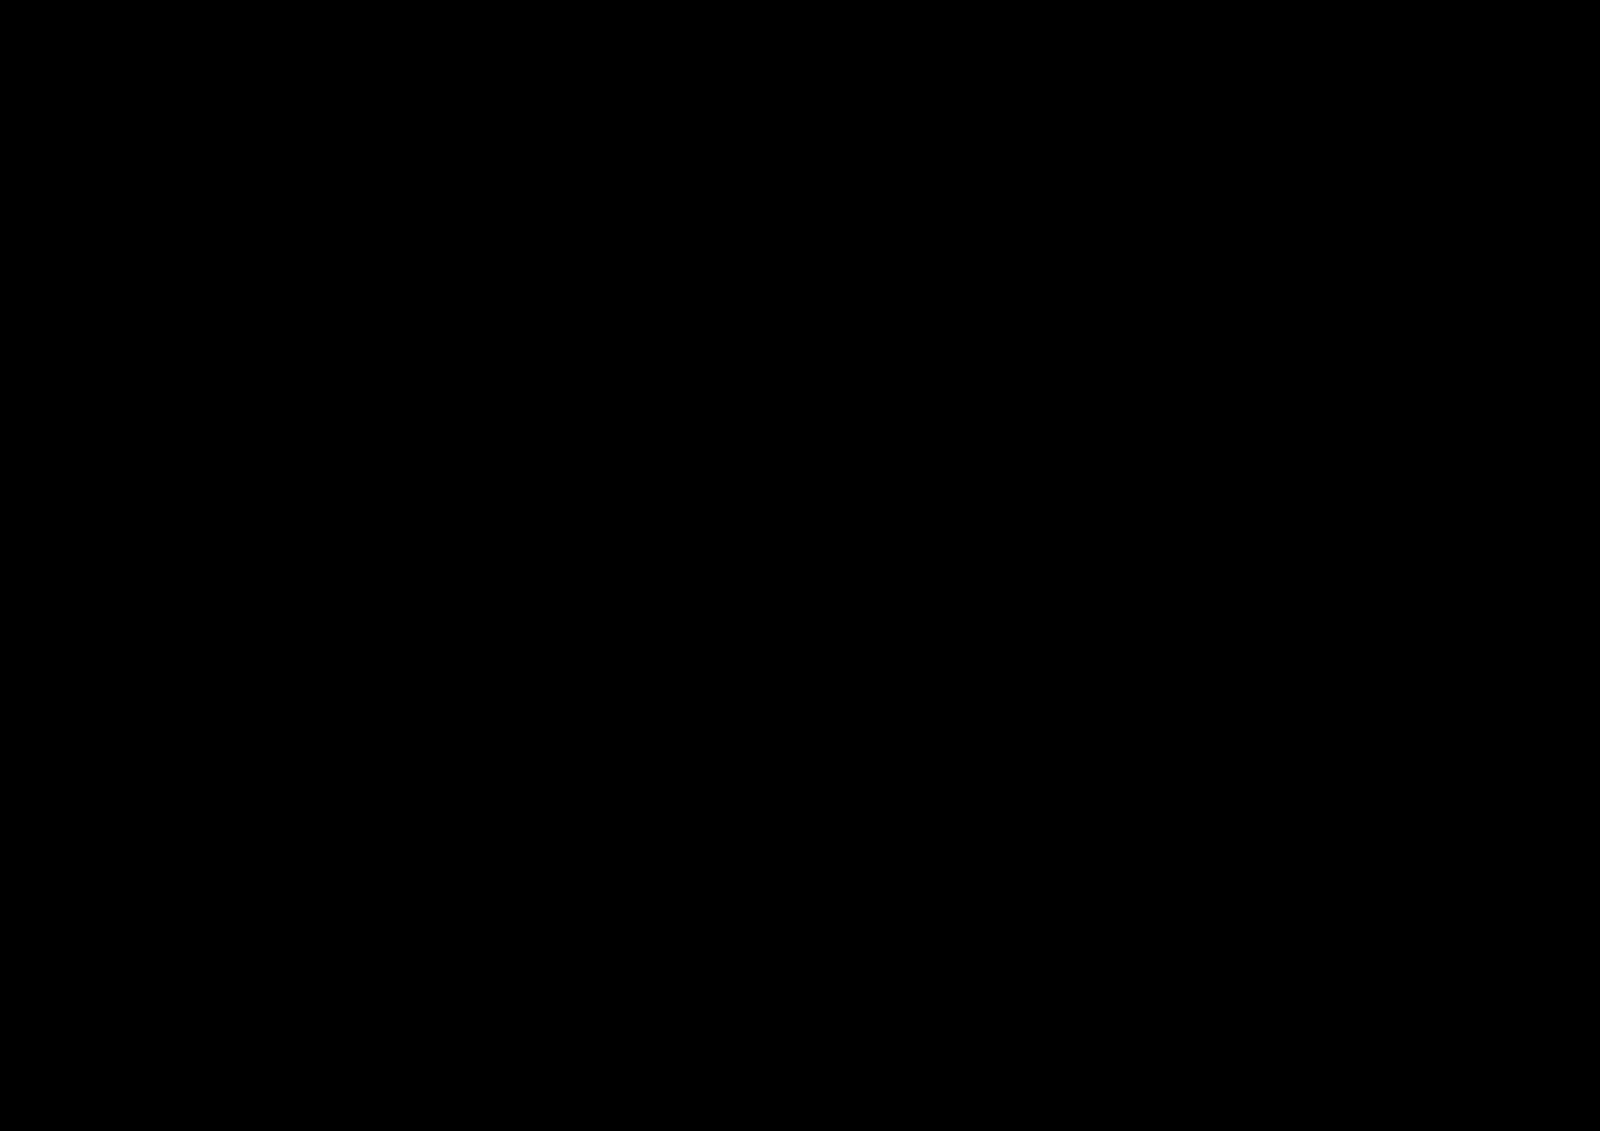 Blackjack strategy simulator